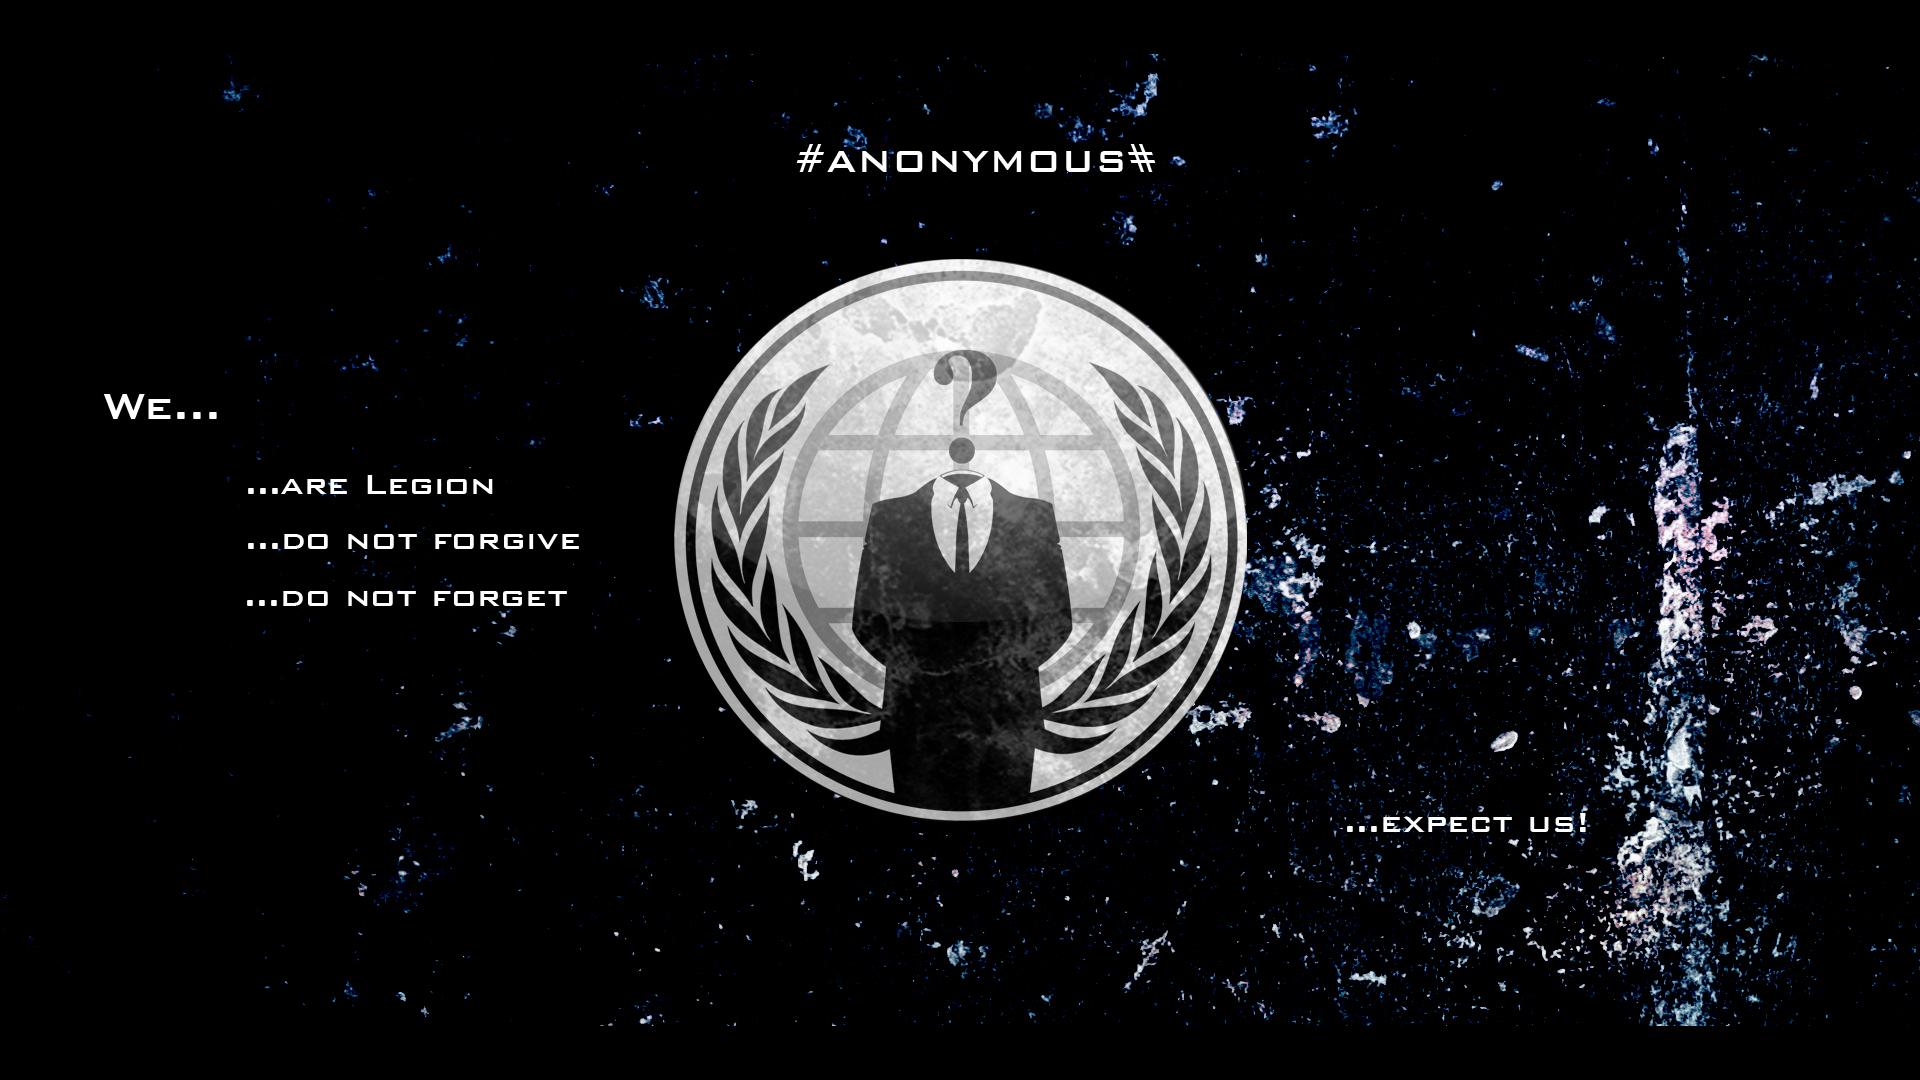 148 Anonymous Fonds D Ecran Hd Arriere Plans Wallpaper Abyss Page 4